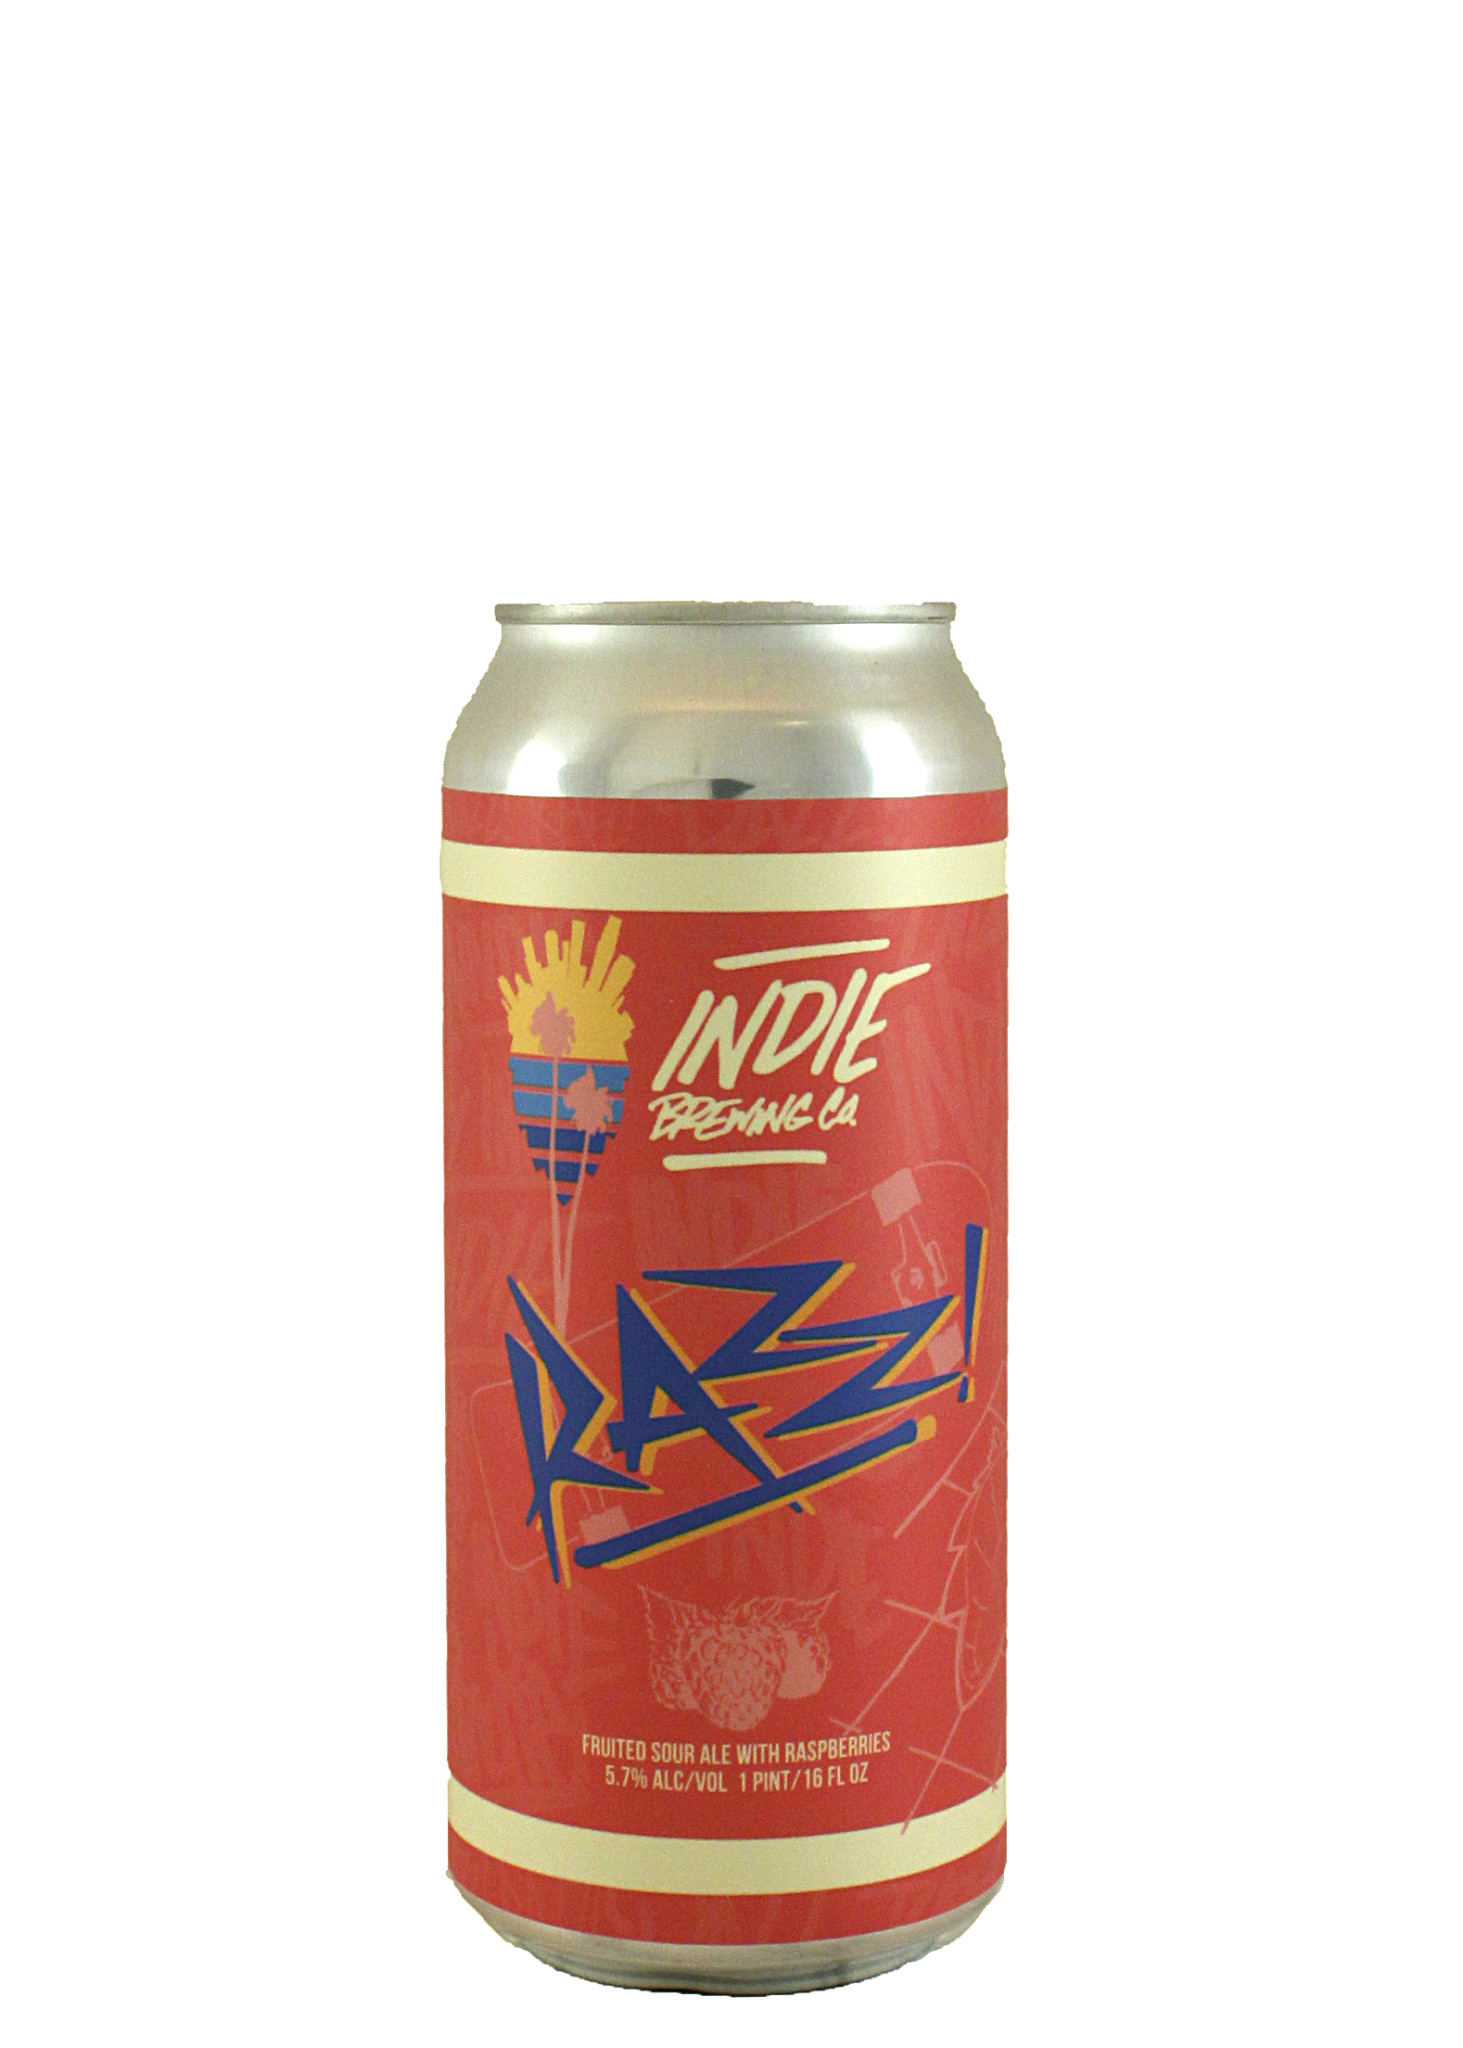 "Indie Brewing ""Razz!"" Fruited Sour Ale w/ Raspberries 16oz. Can - Los Angeles, CA"